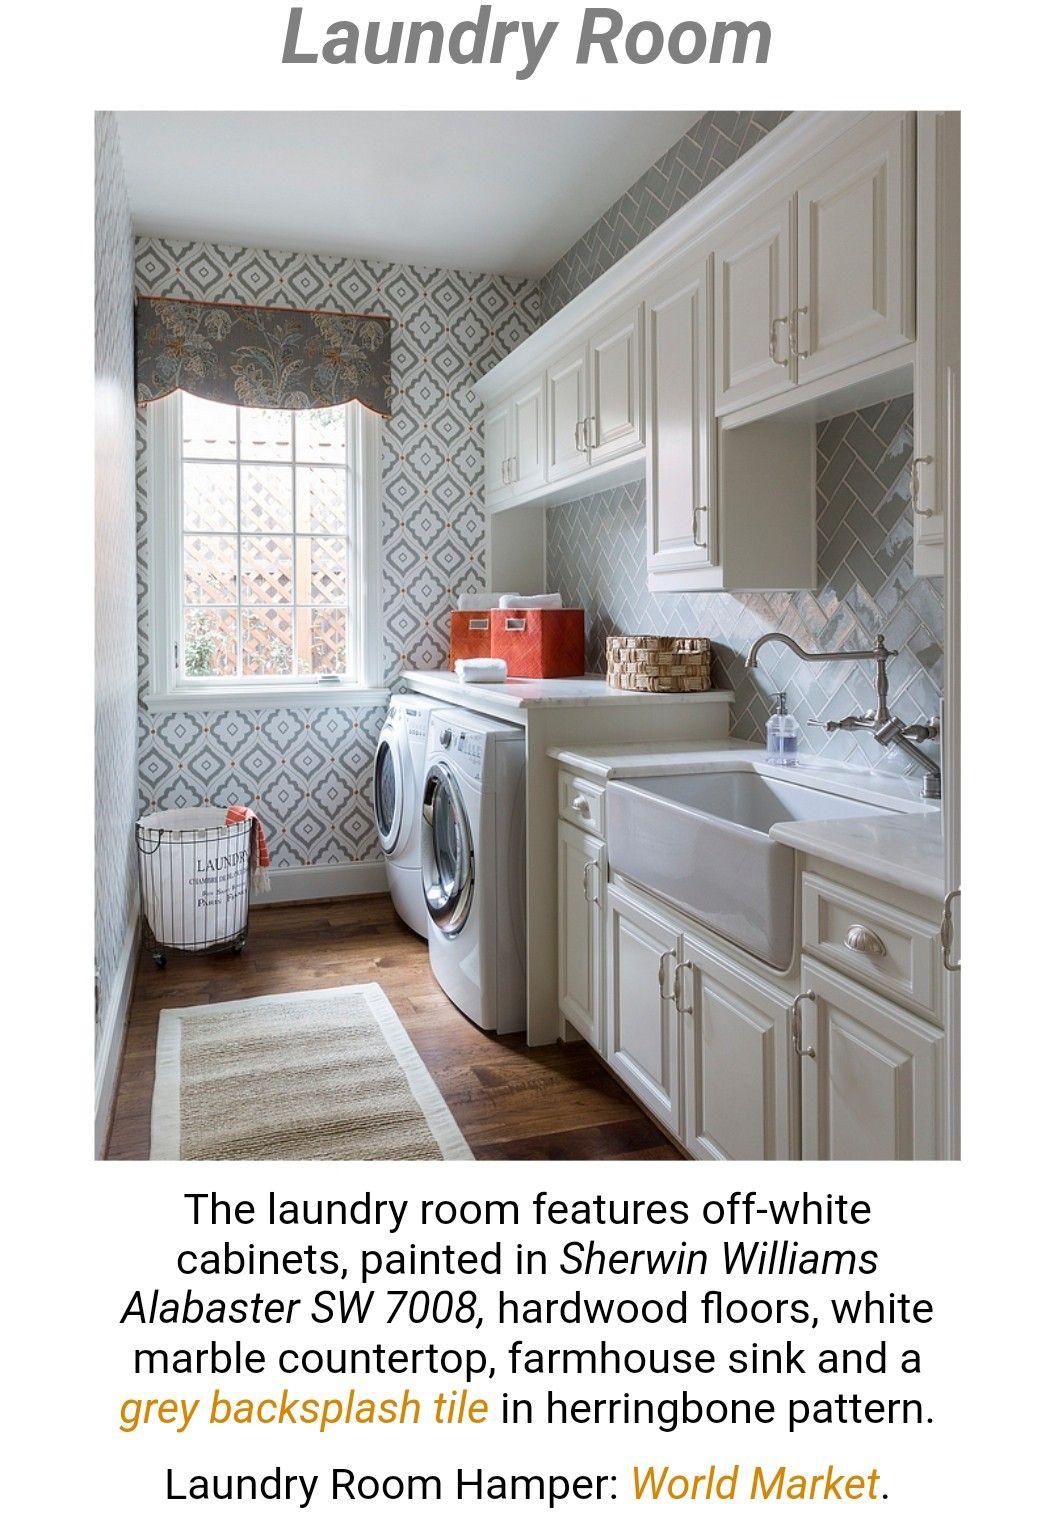 Terrific Pin By Anita K On Home Ideas Etc Kitchen Cabinets Home Interior Design Ideas Oteneahmetsinanyavuzinfo